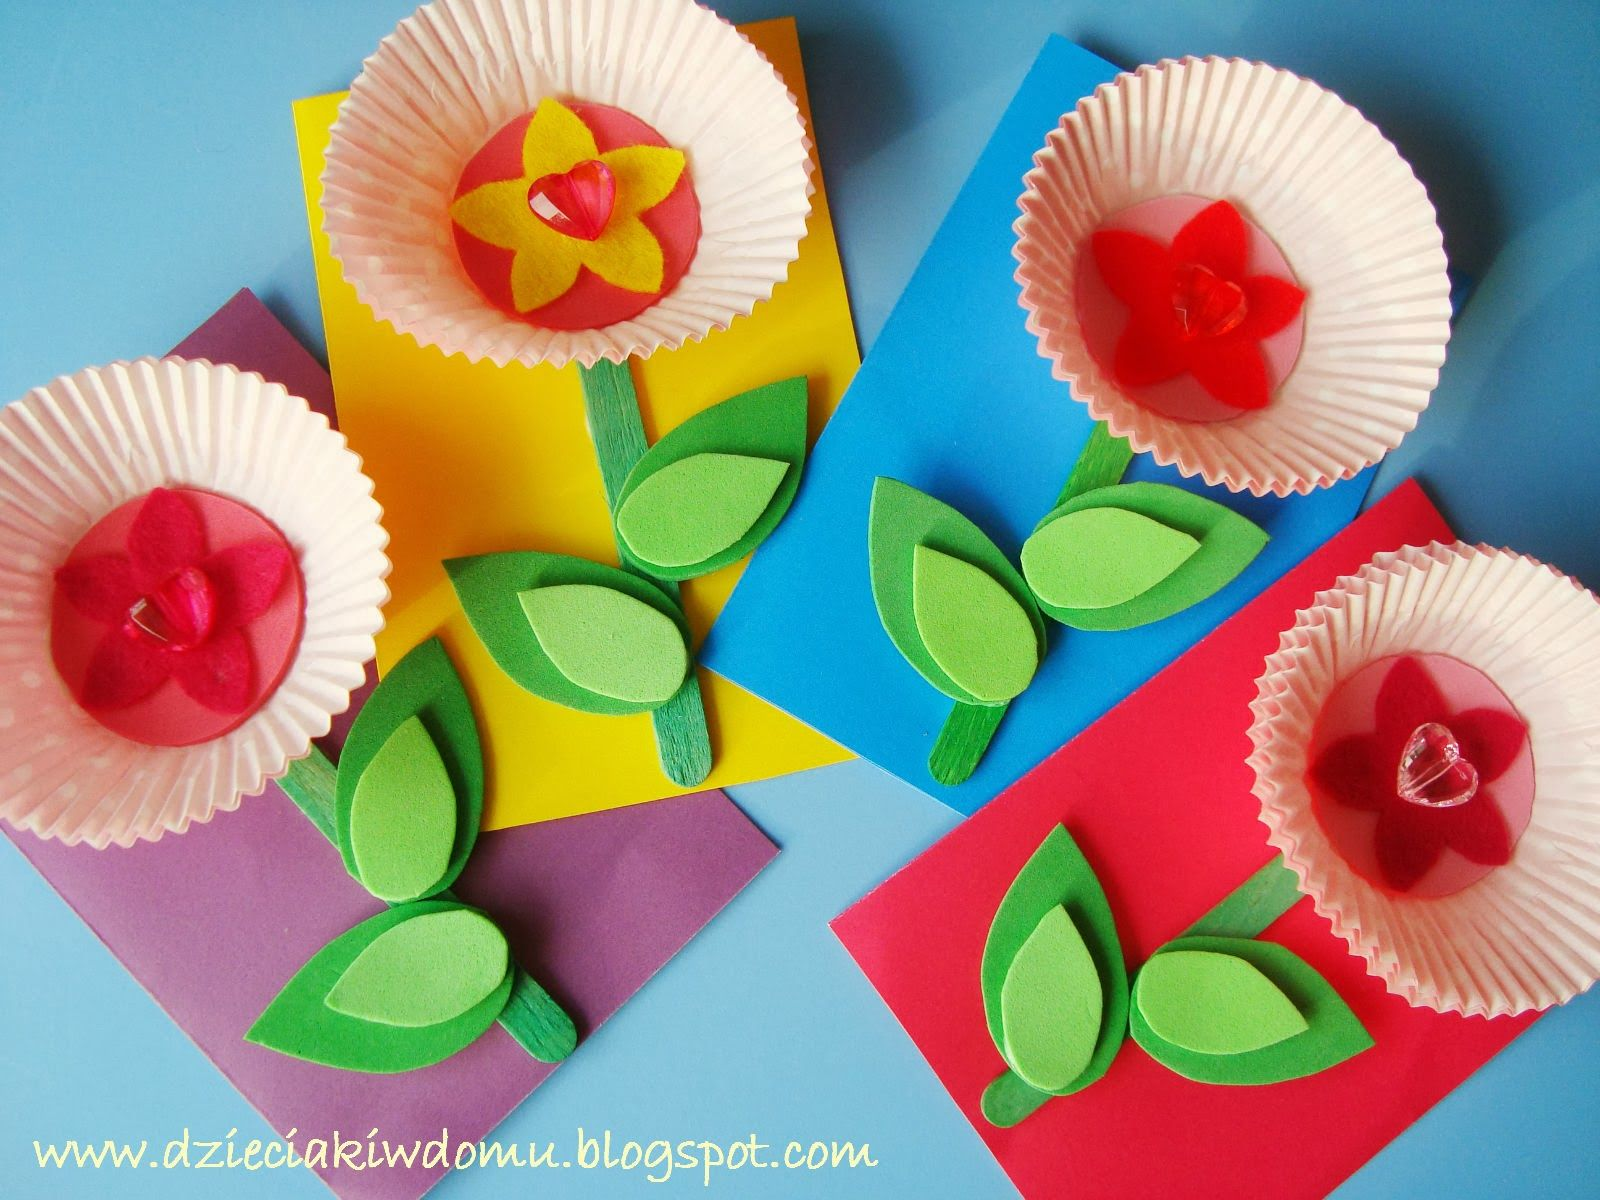 Kwiatek Na Dzien Babci Dzieciaki W Domu Spring Crafts For Kids Grandparents Day Crafts Crafts For Kids